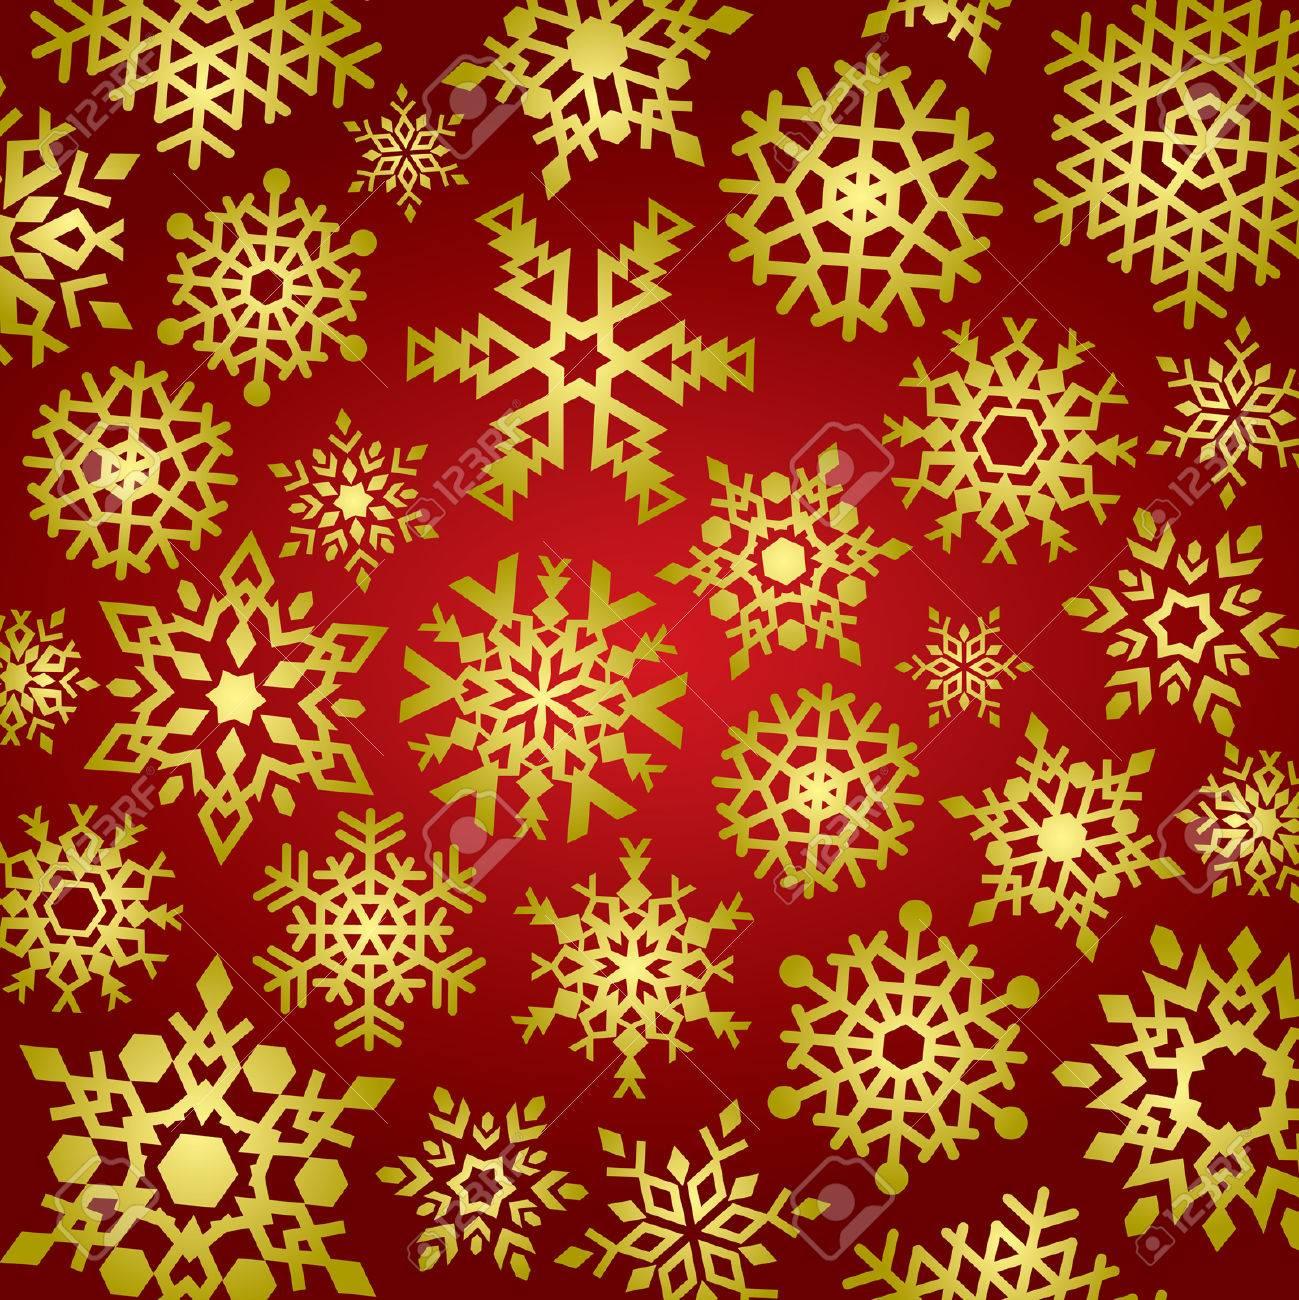 Snowflakes Background Stock Vector - 1989495